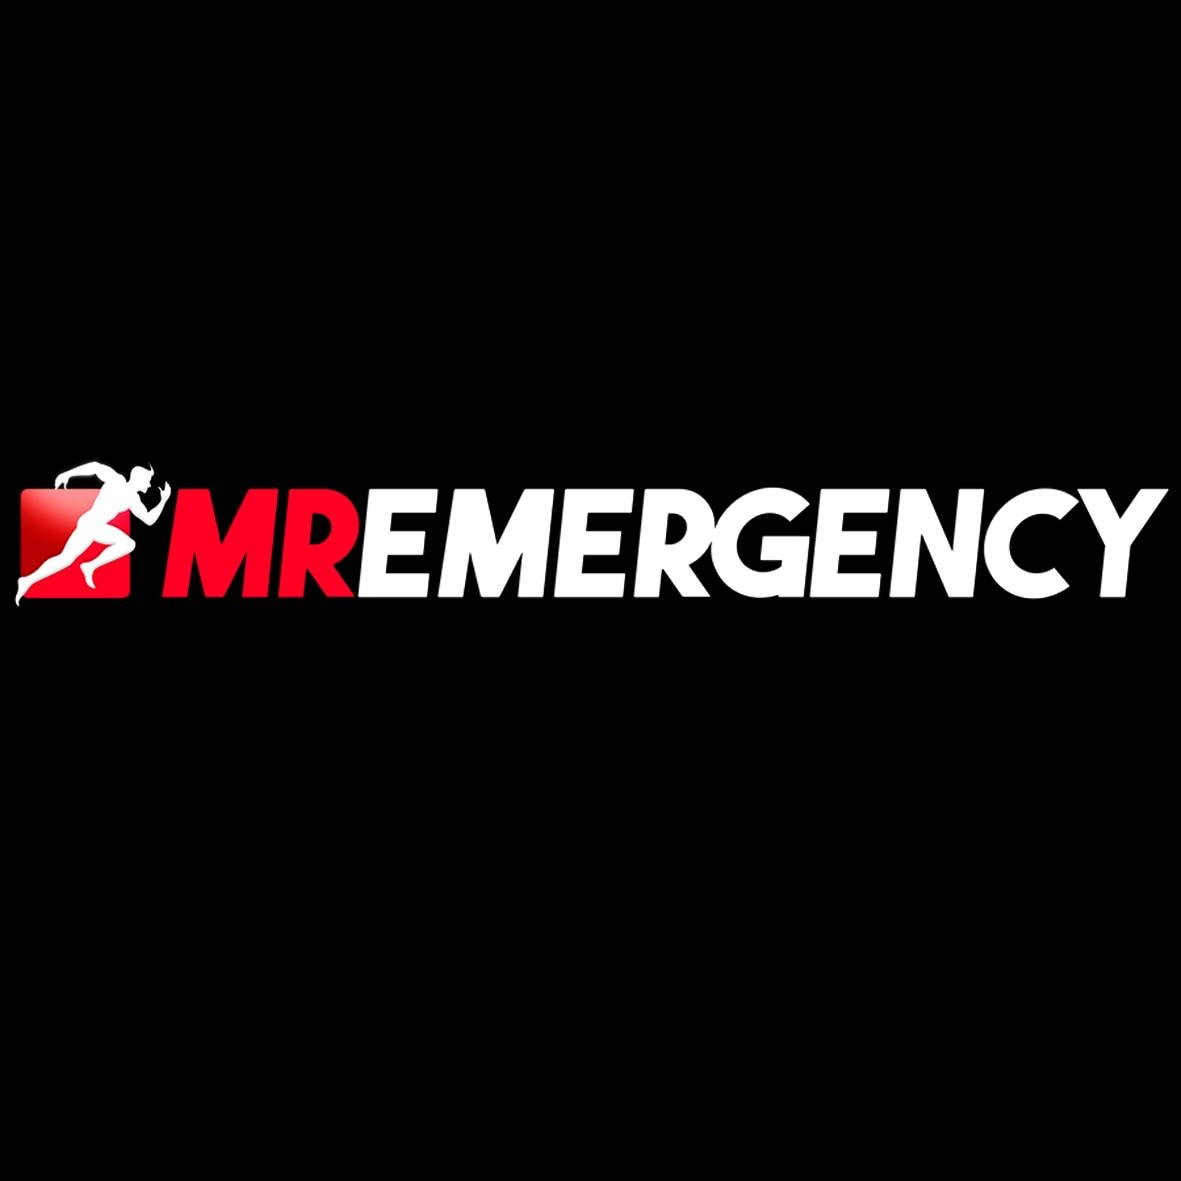 Mr Emergency Scarborough